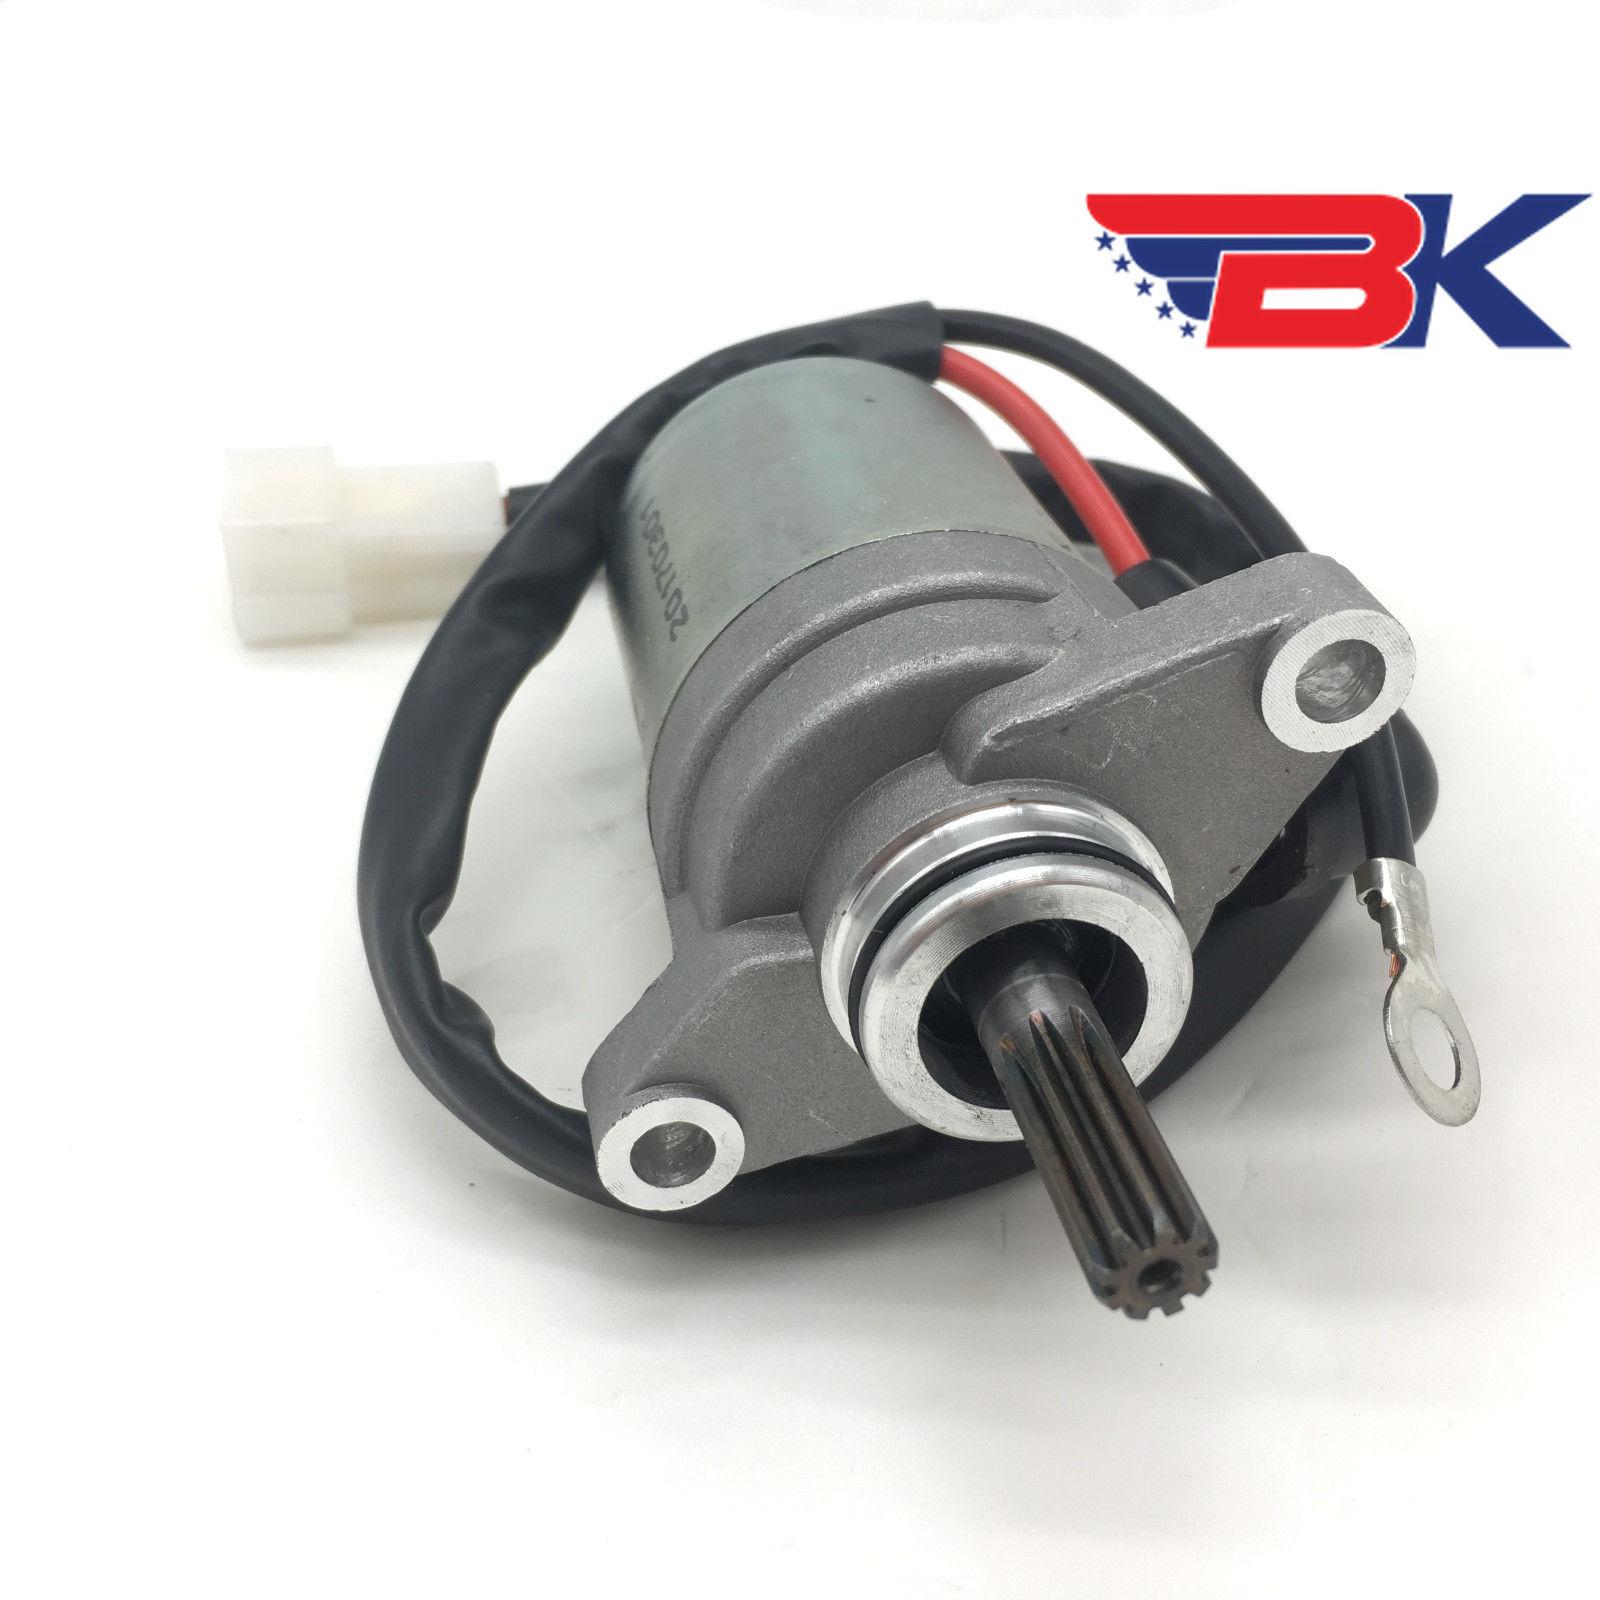 US $9 99 |Starter Motor For 2 Stroke 90cc Engine Polaris 90cc Dinli 90cc  Motorcycle ATV-in Motorcycle Starter from Automobiles & Motorcycles on